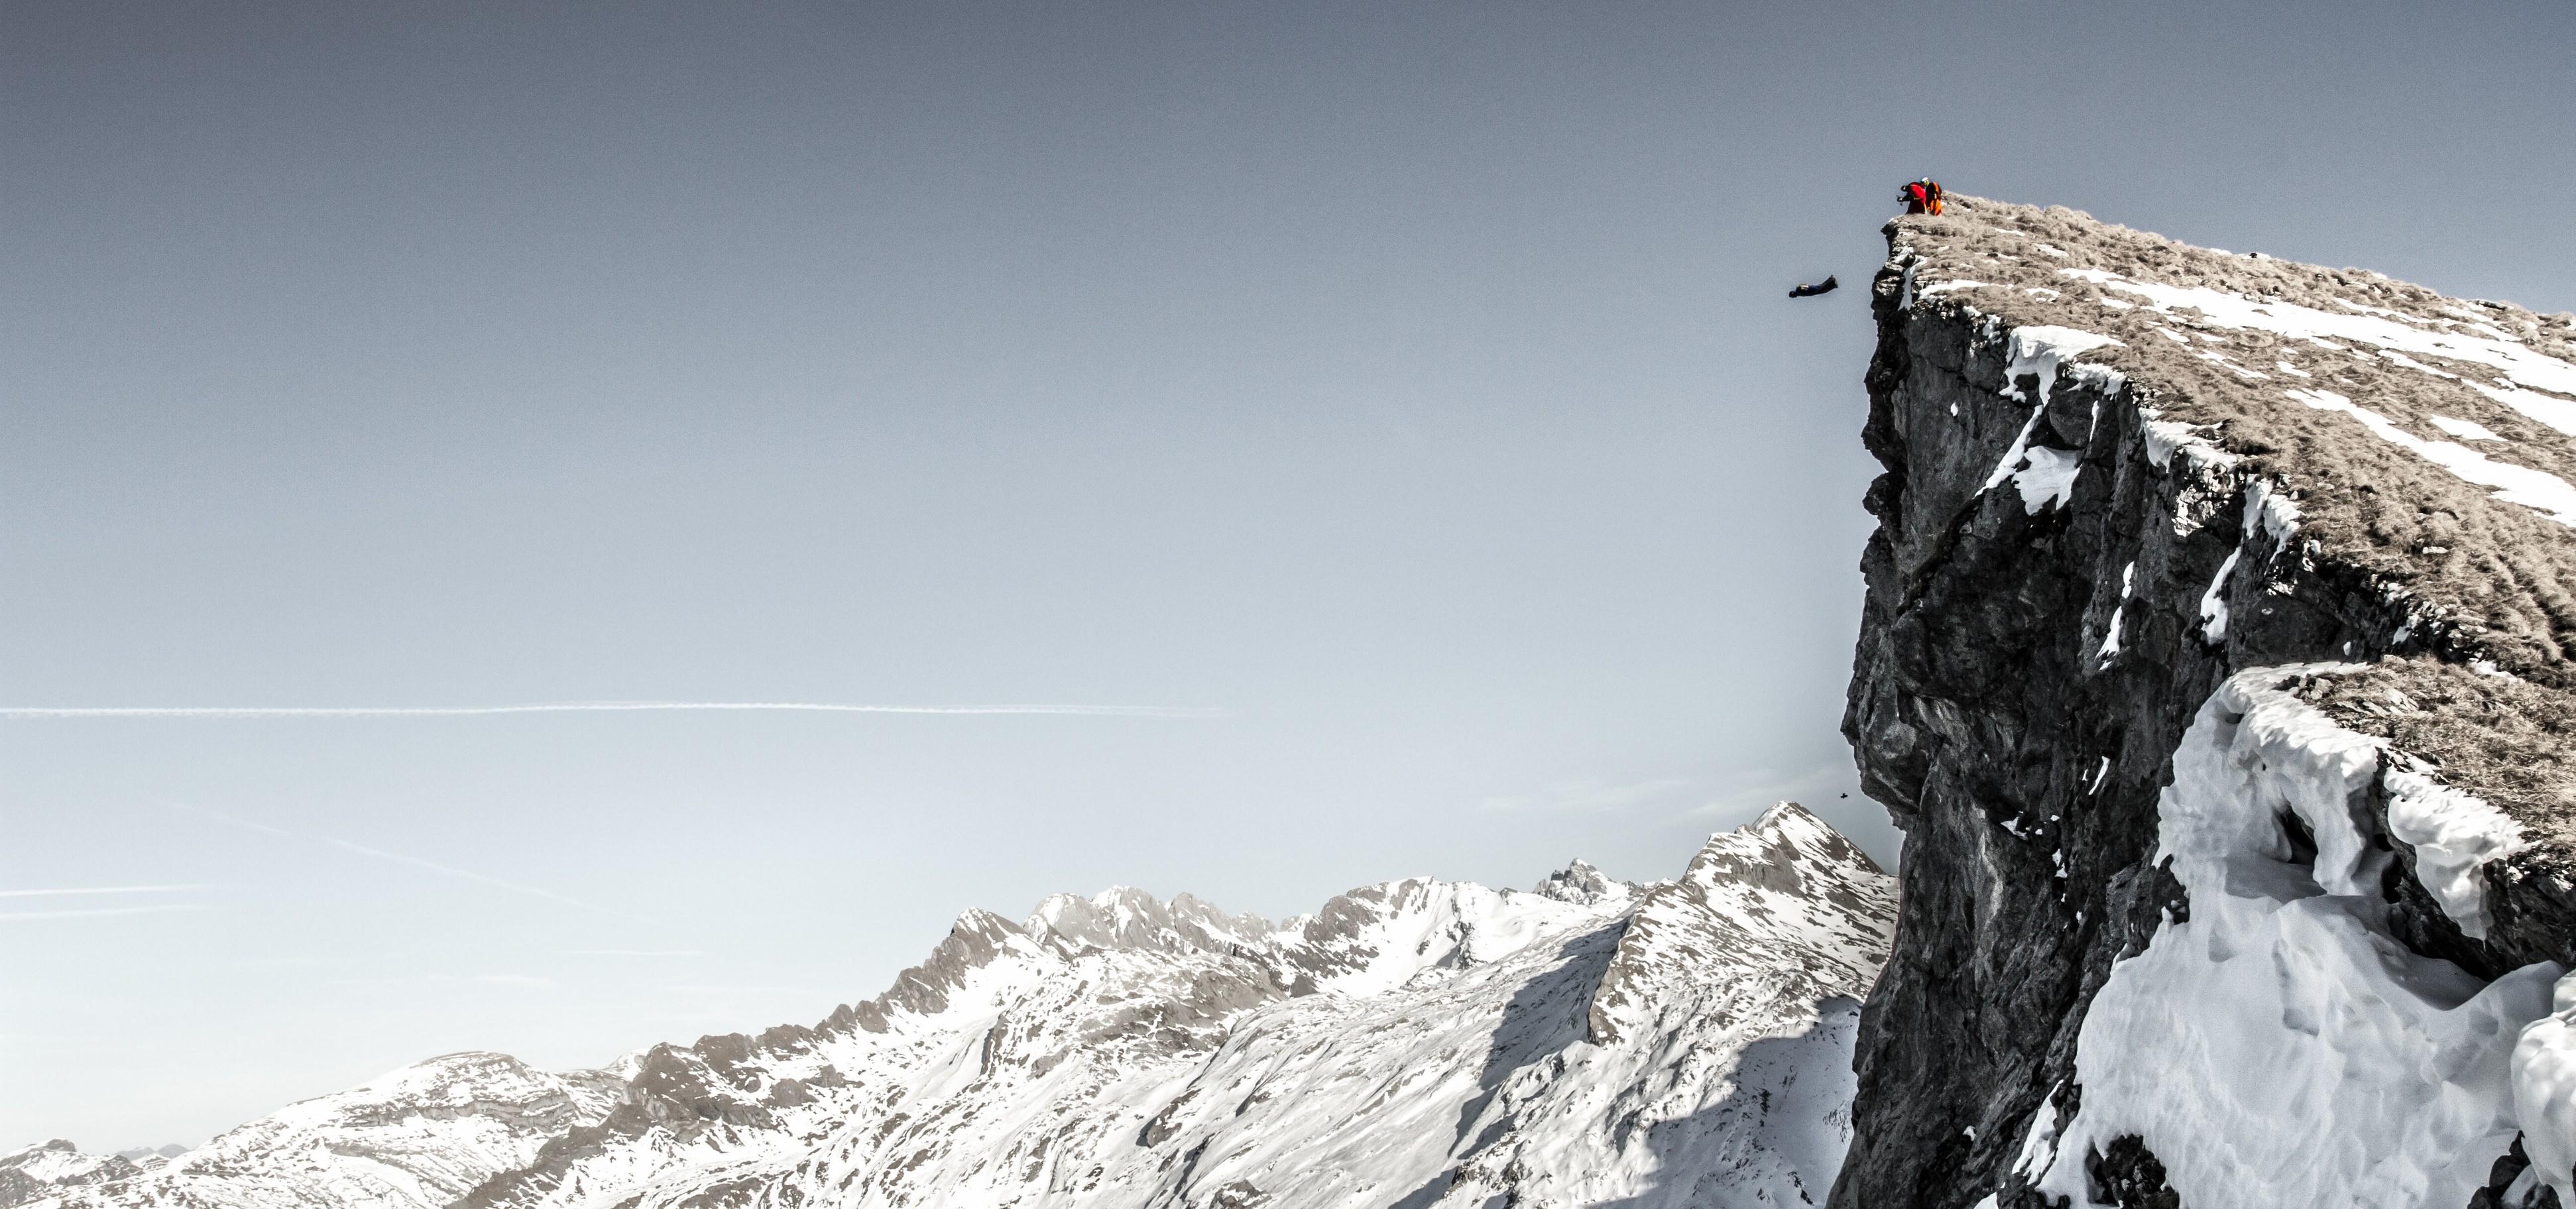 fond d 39 cran des sports paysage montagnes la nature neige hiver falaise alpes sommet. Black Bedroom Furniture Sets. Home Design Ideas